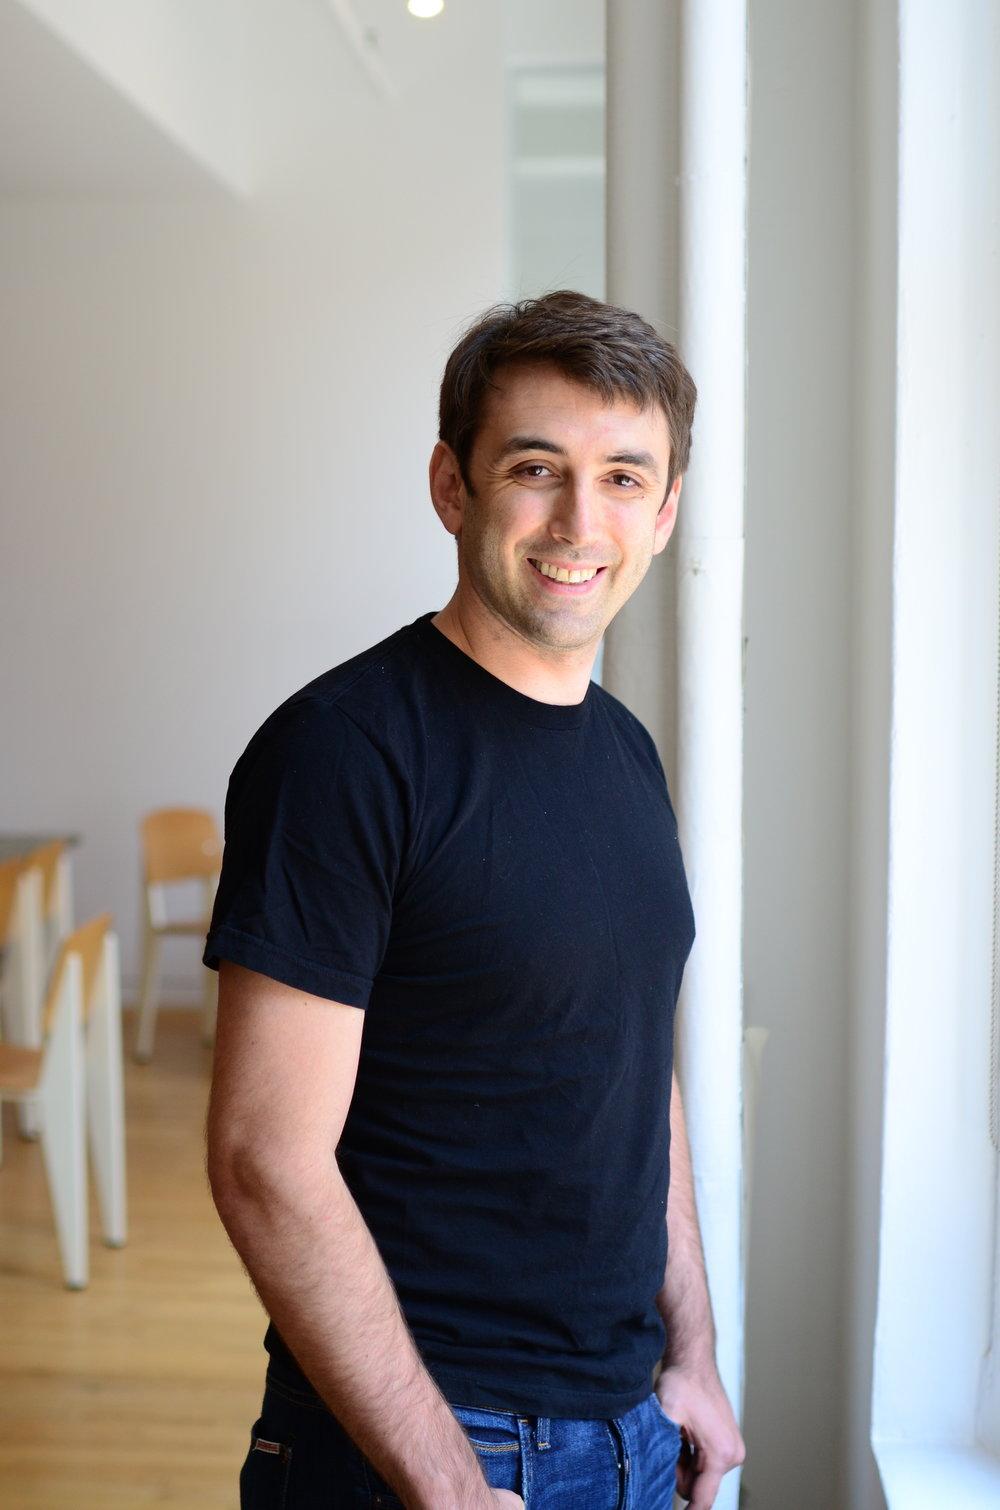 Jake Schwartz, General Assembly